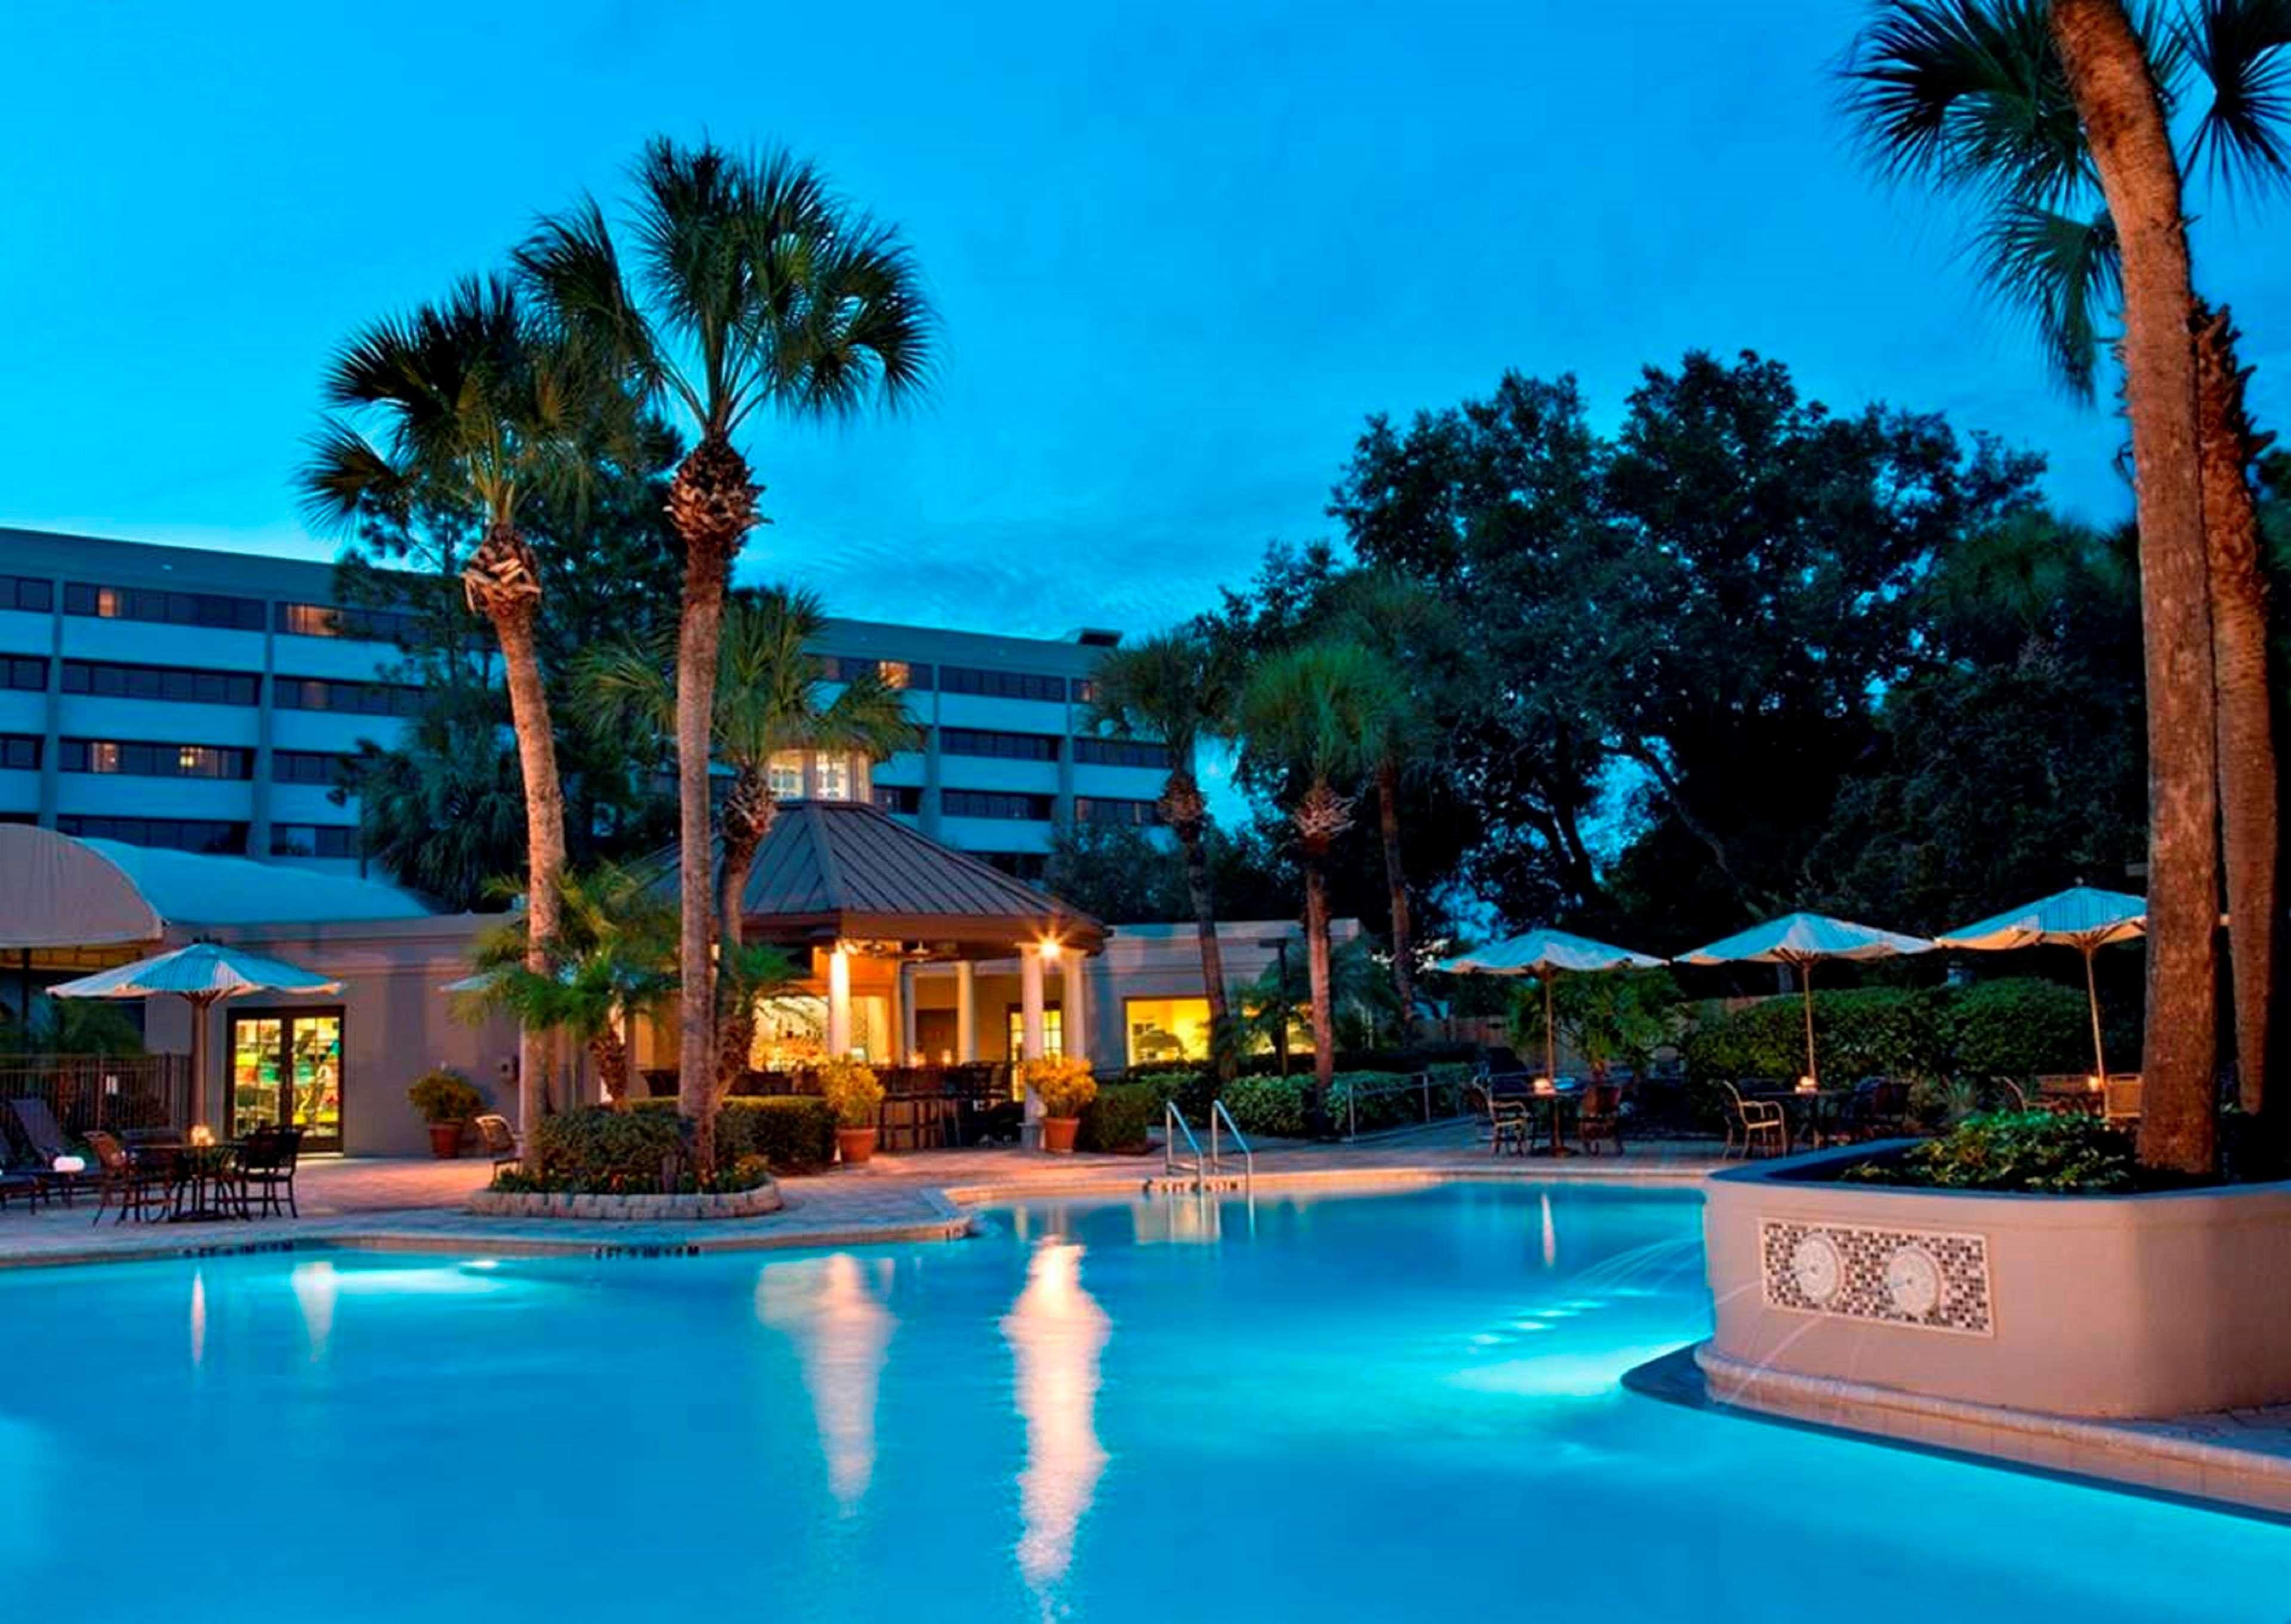 DoubleTree Suites by Hilton Orlando - Disney Springs Area image 5